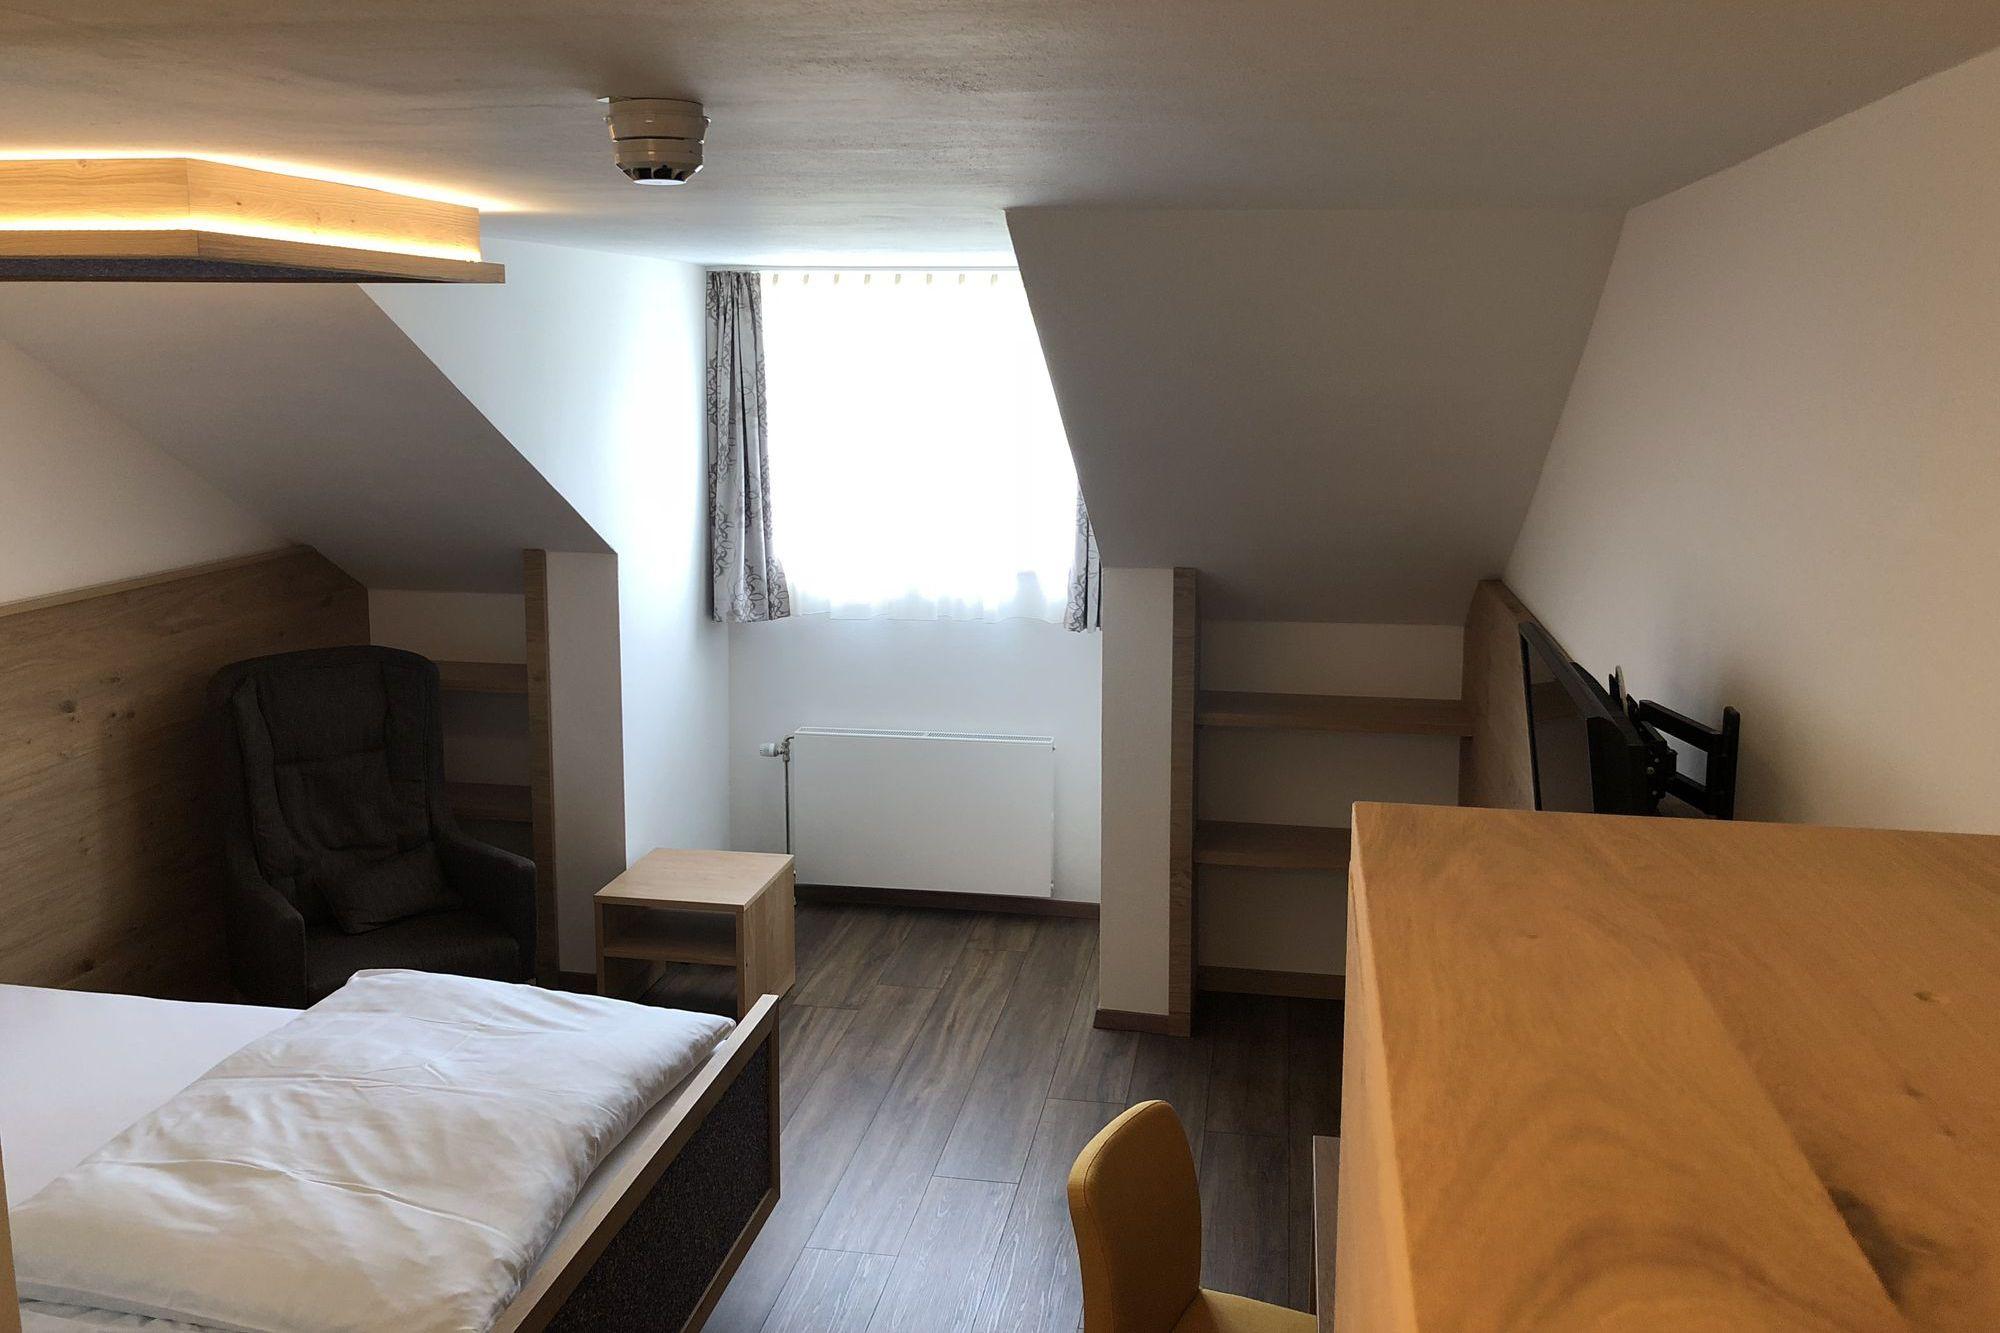 http://www.hotelbinder.de/wp-content/uploads/einzelzimmer1_2.jpg